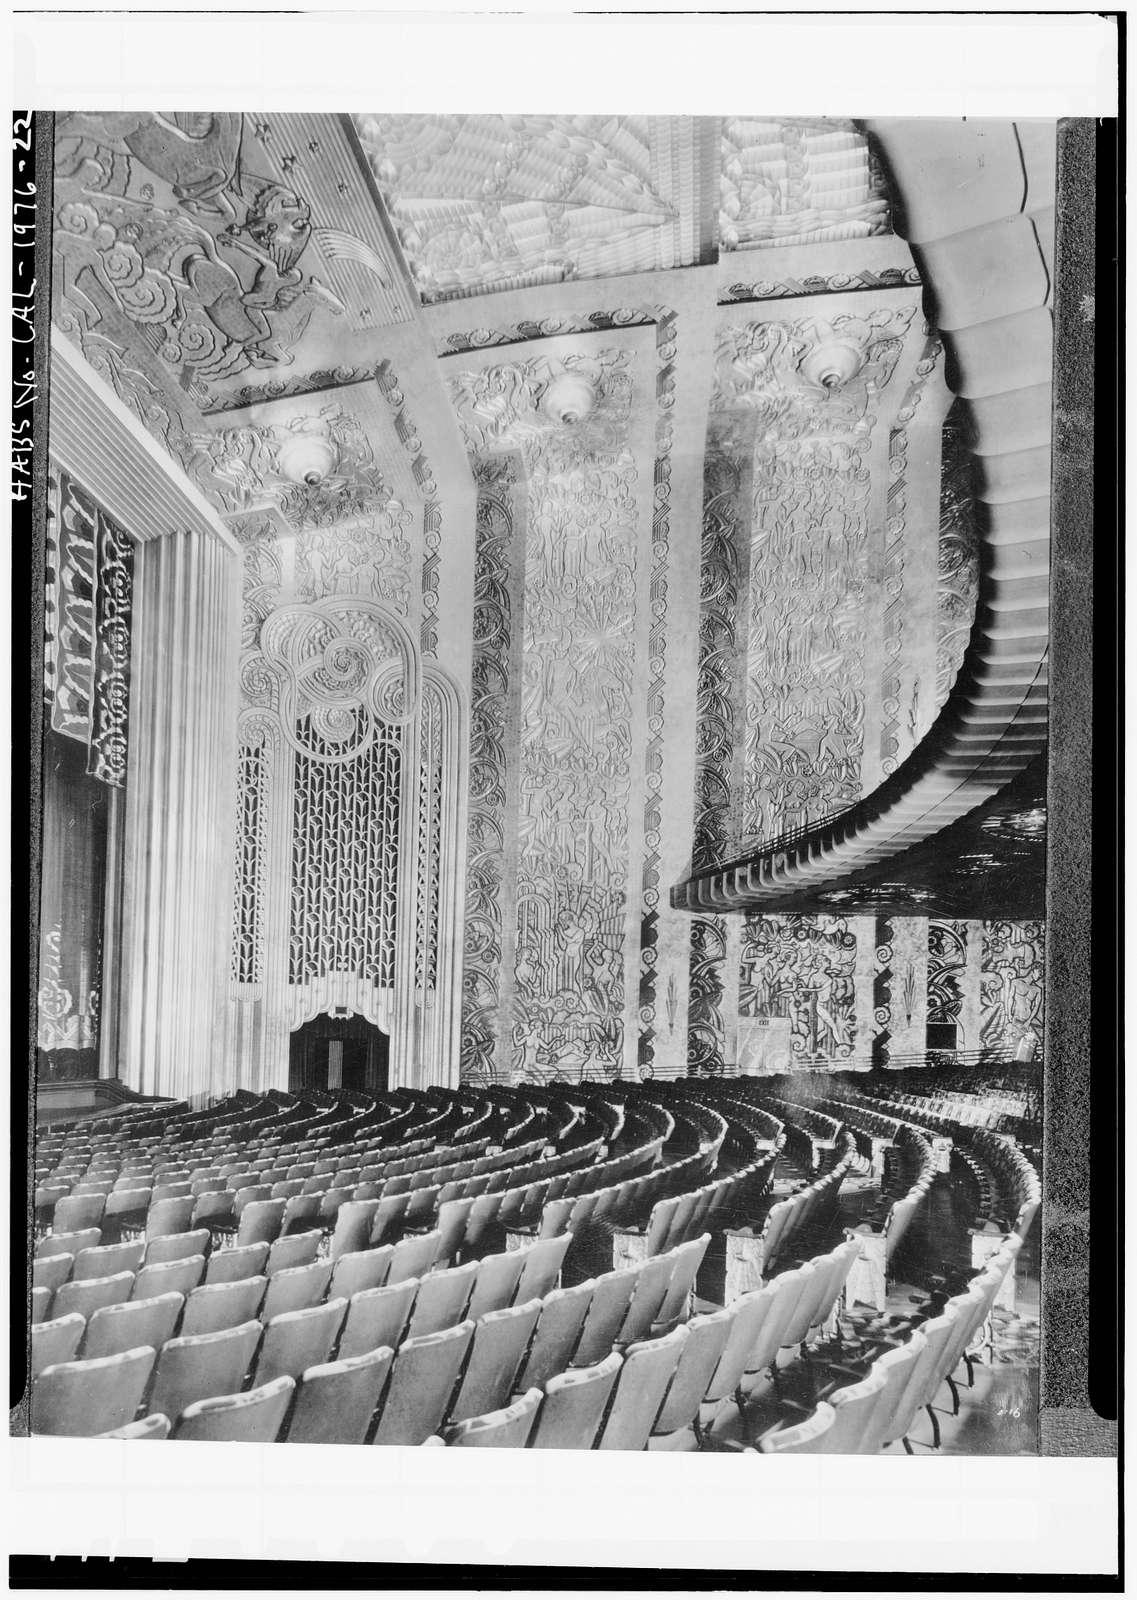 Paramount Theatre, 2025 Broadway, Oakland, Alameda County, CA